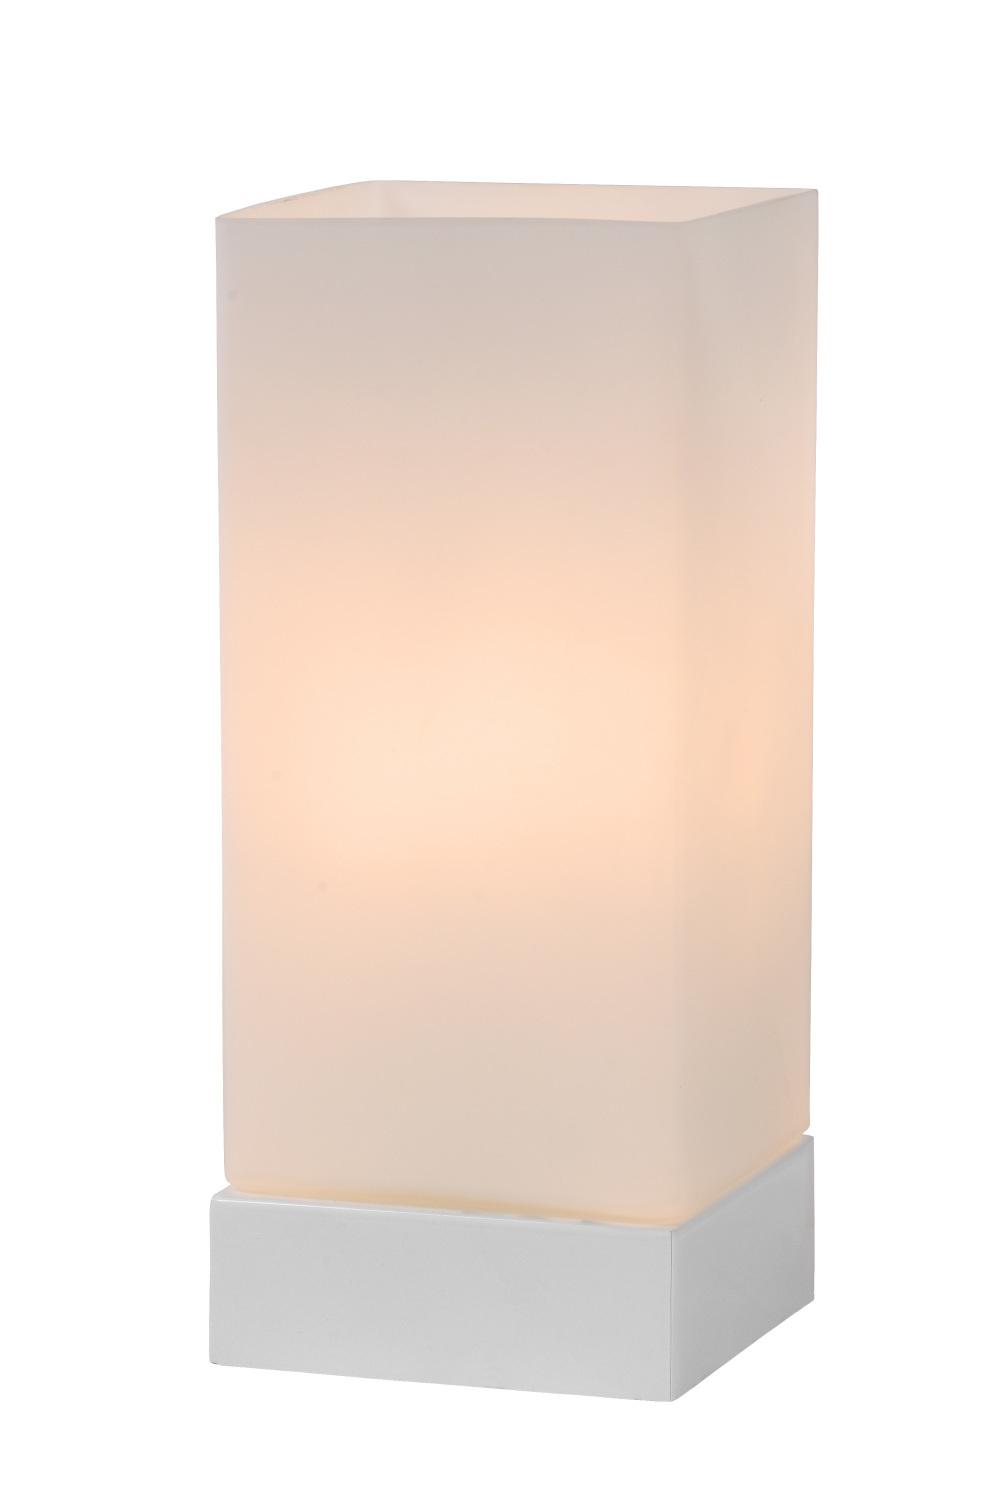 Lucide COLOUR-T. Tafellamp-Opaal-1xE14-40W-3 StepDim-Glas